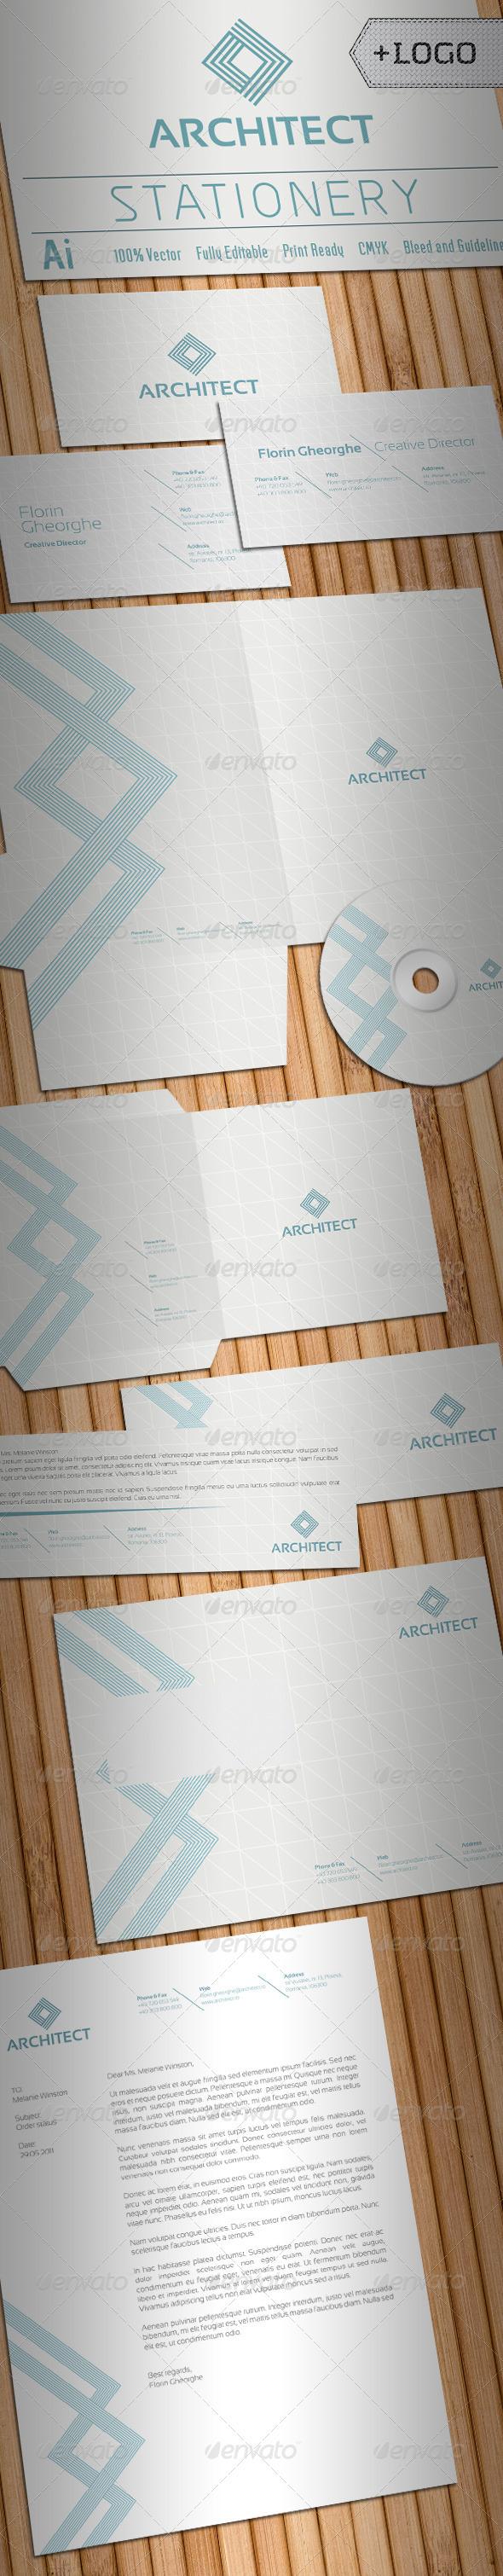 Architect Stationery - Stationery Print Templates